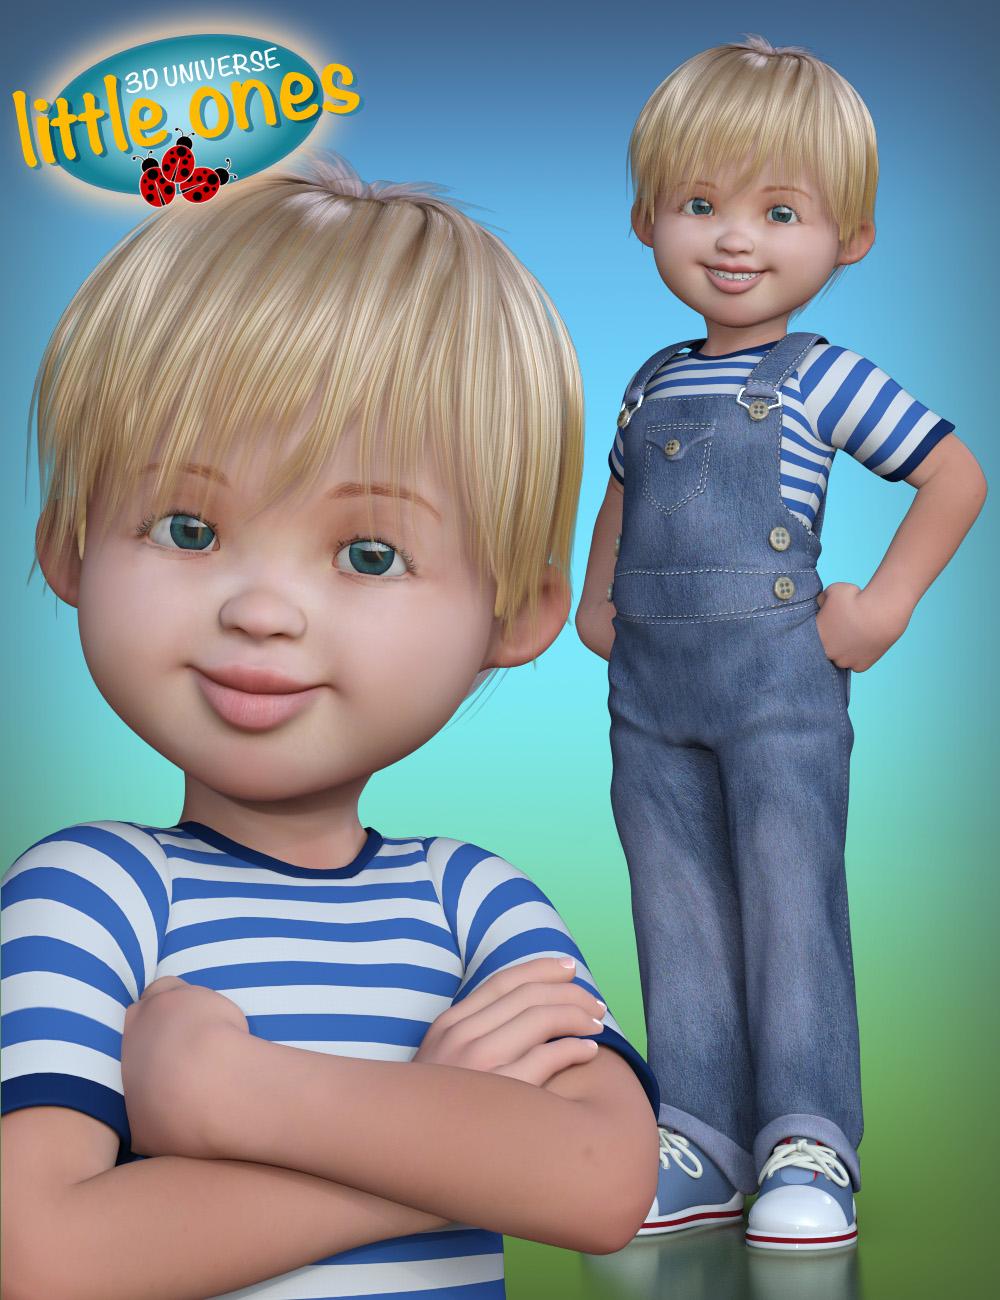 Little Ones (Caucasian Male) for Genesis 3 Male by: 3D Universe, 3D Models by Daz 3D